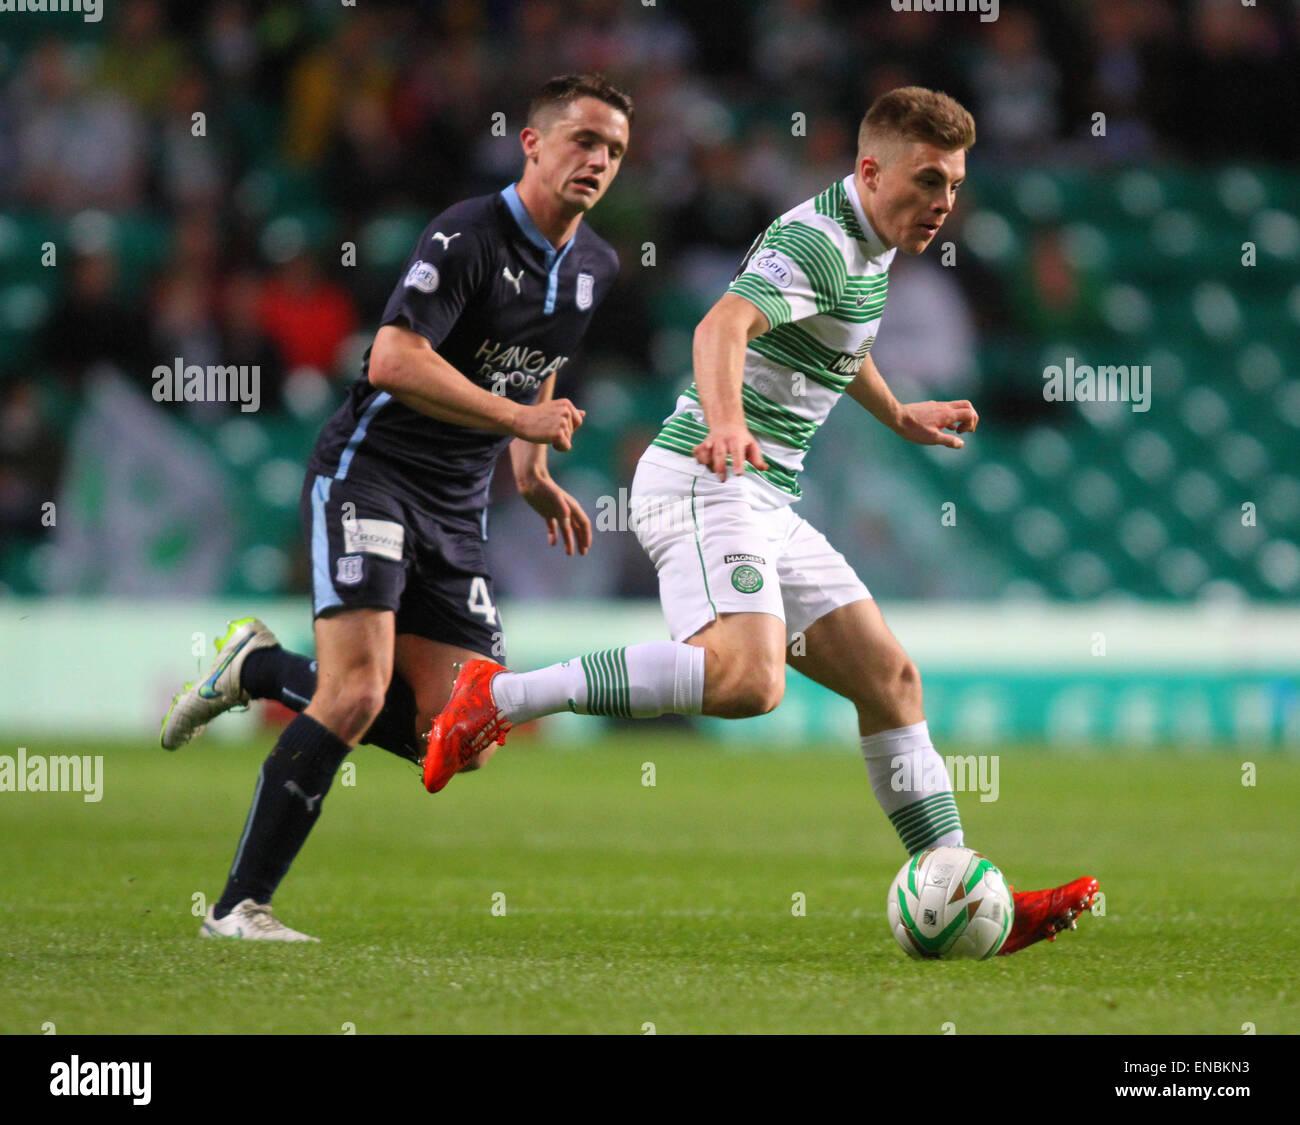 Glasgow, Scotland. 01st May, 2015. Scottish Premiership. Celtic versus Dundee. James Forrest and Thomas Konrad Credit: - Stock Image